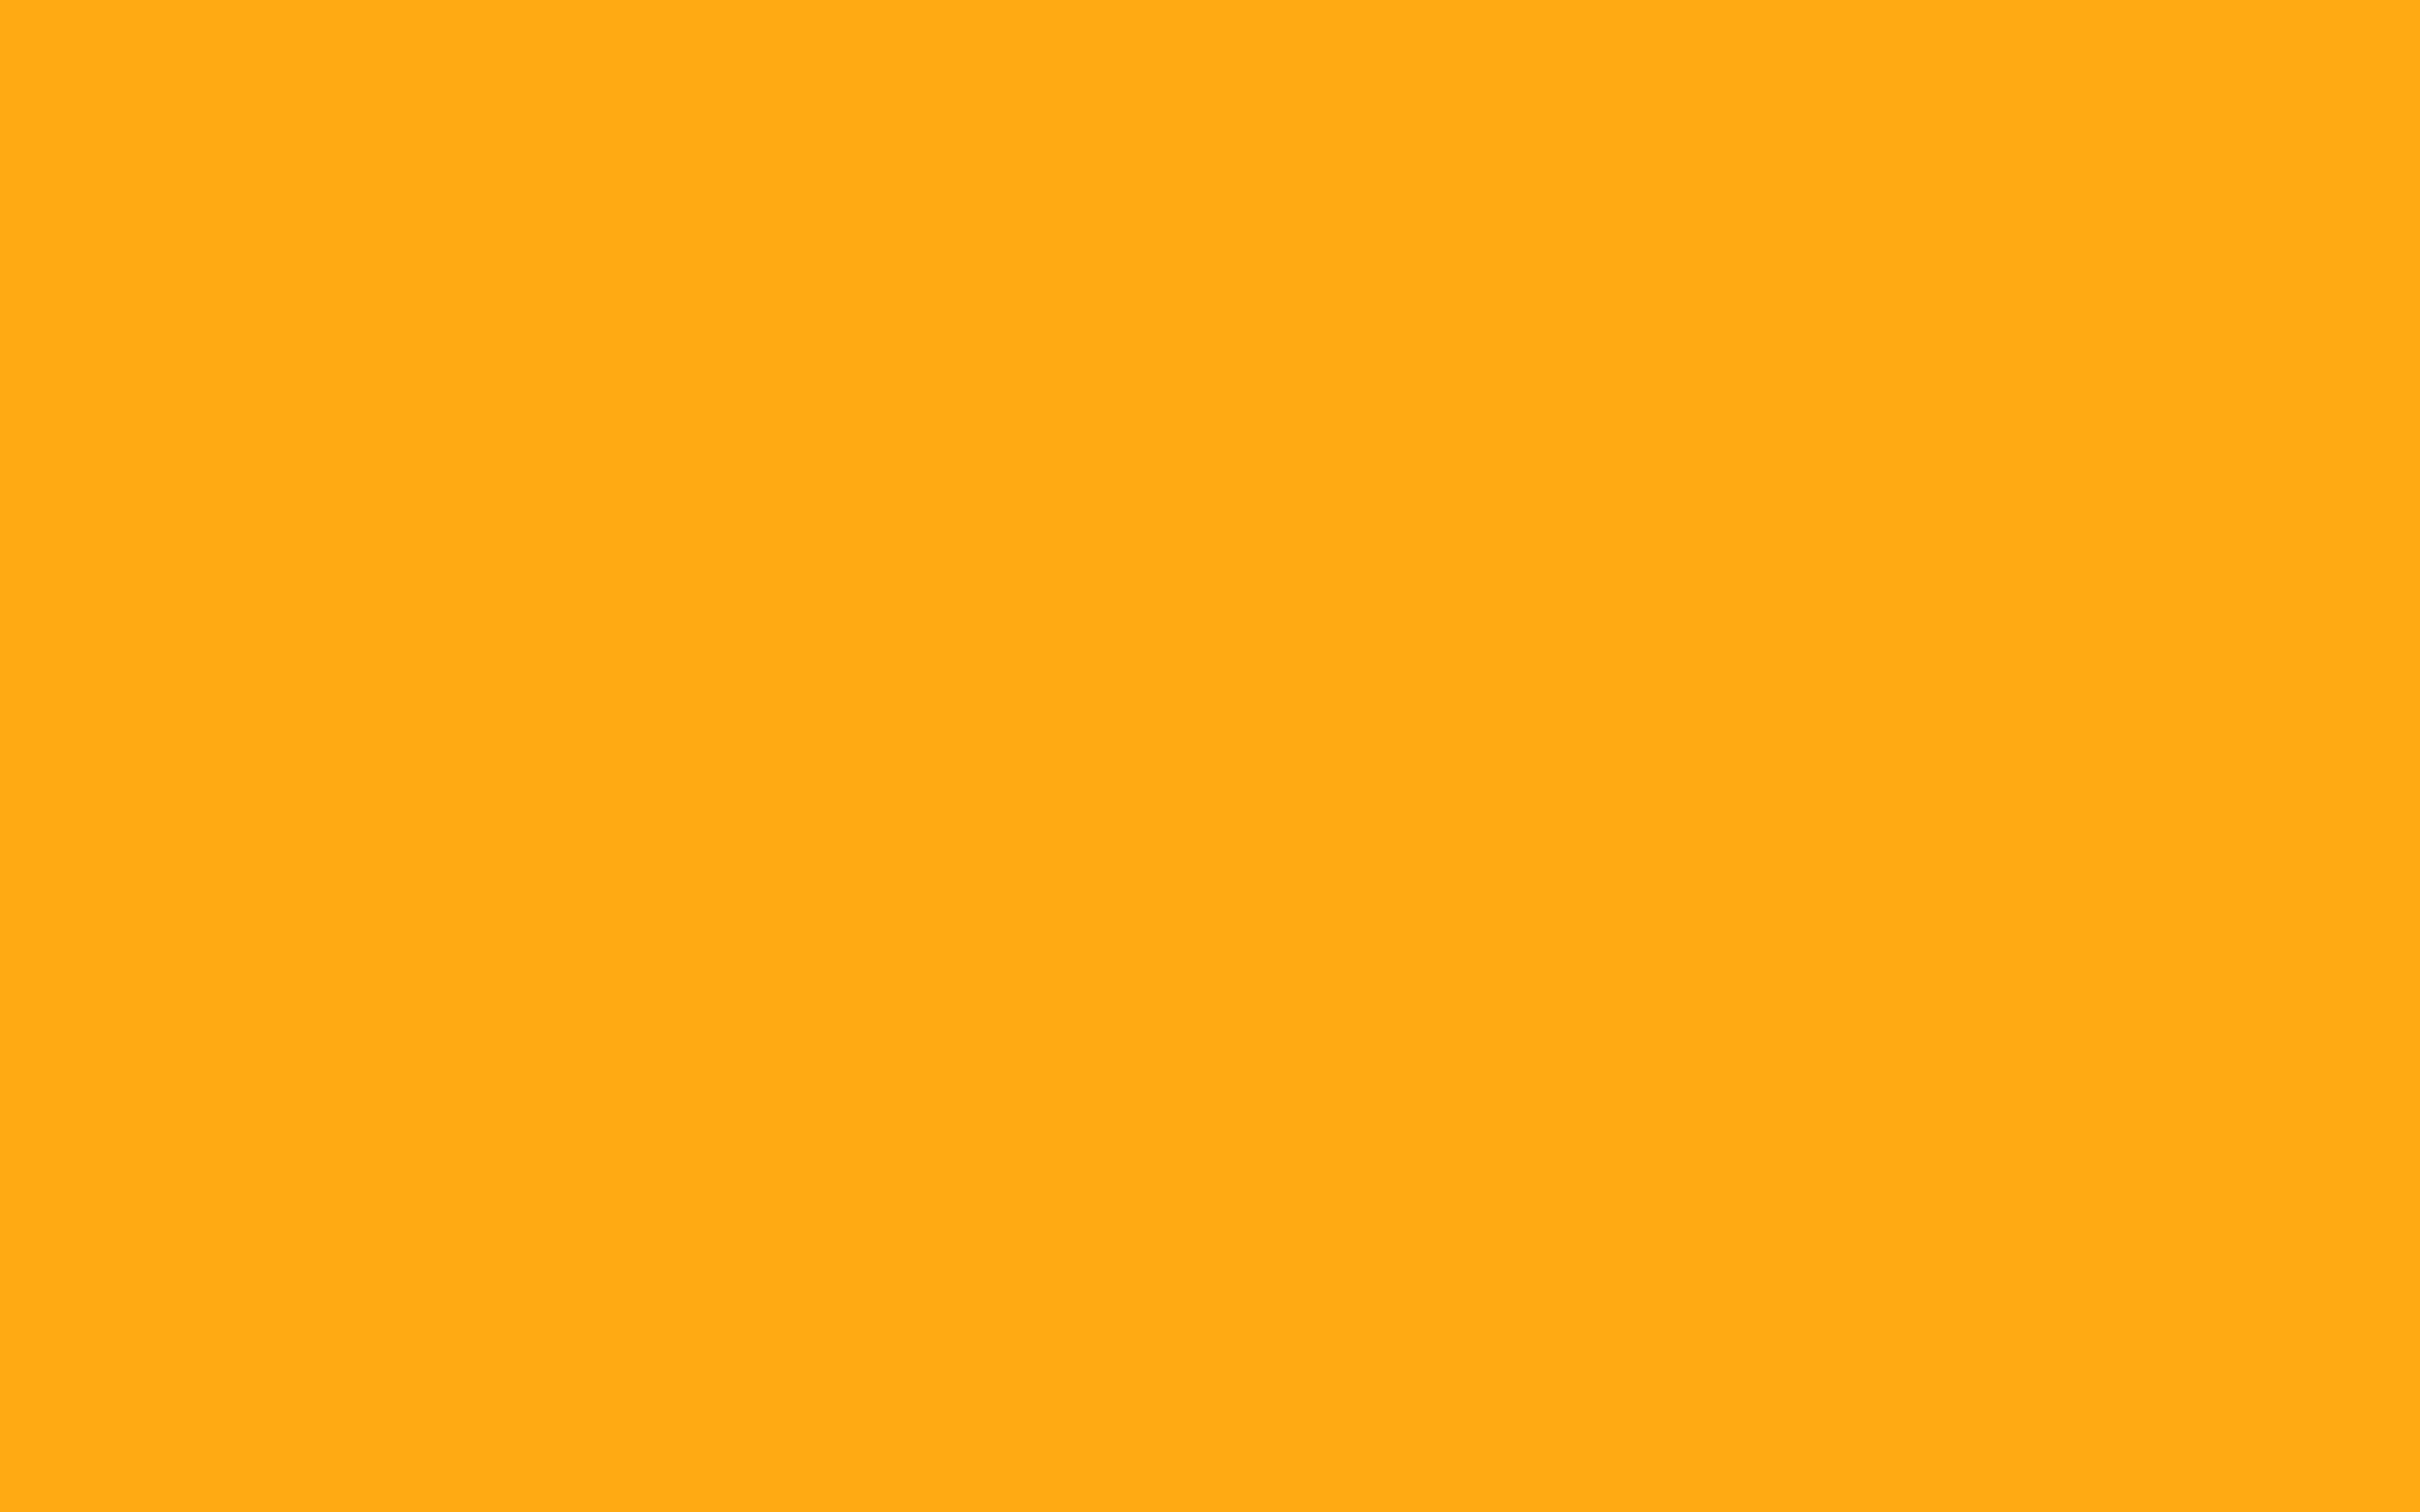 2560x1600 Dark Tangerine Solid Color Background